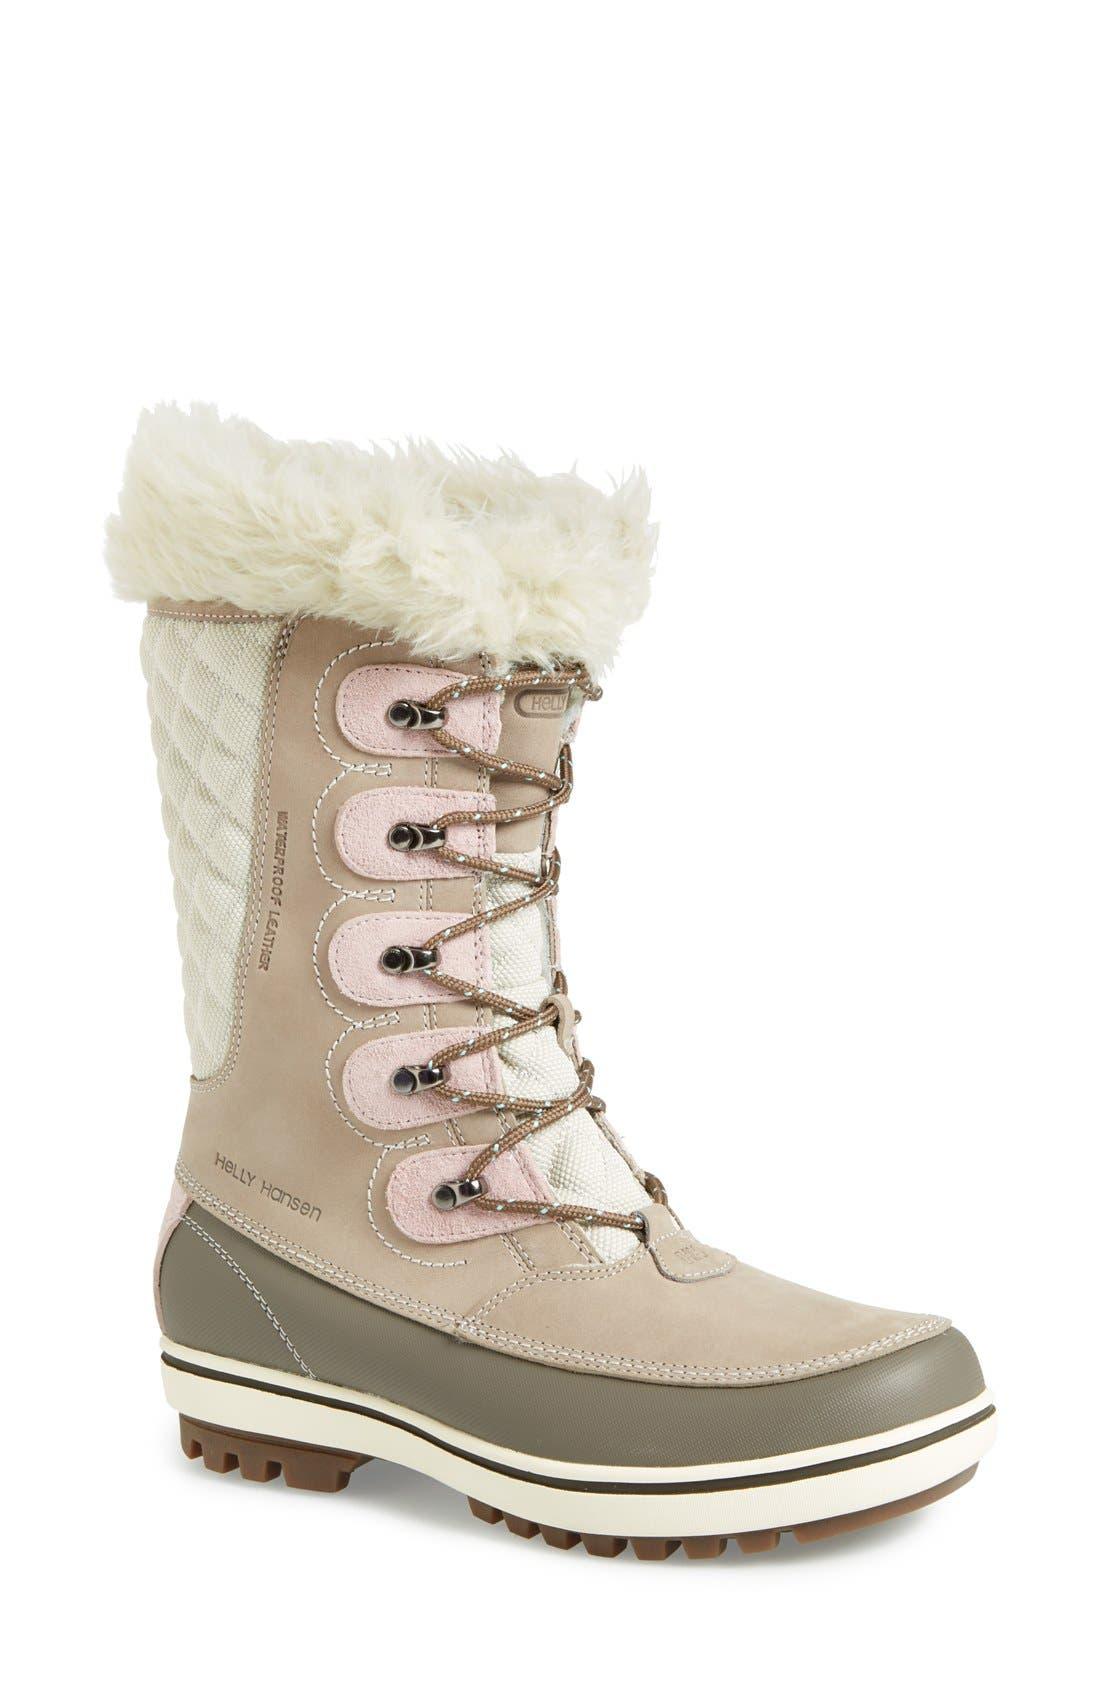 Alternate Image 1 Selected - Helly Hansen 'Garibaldi' Waterproof Snow Boot (Women)